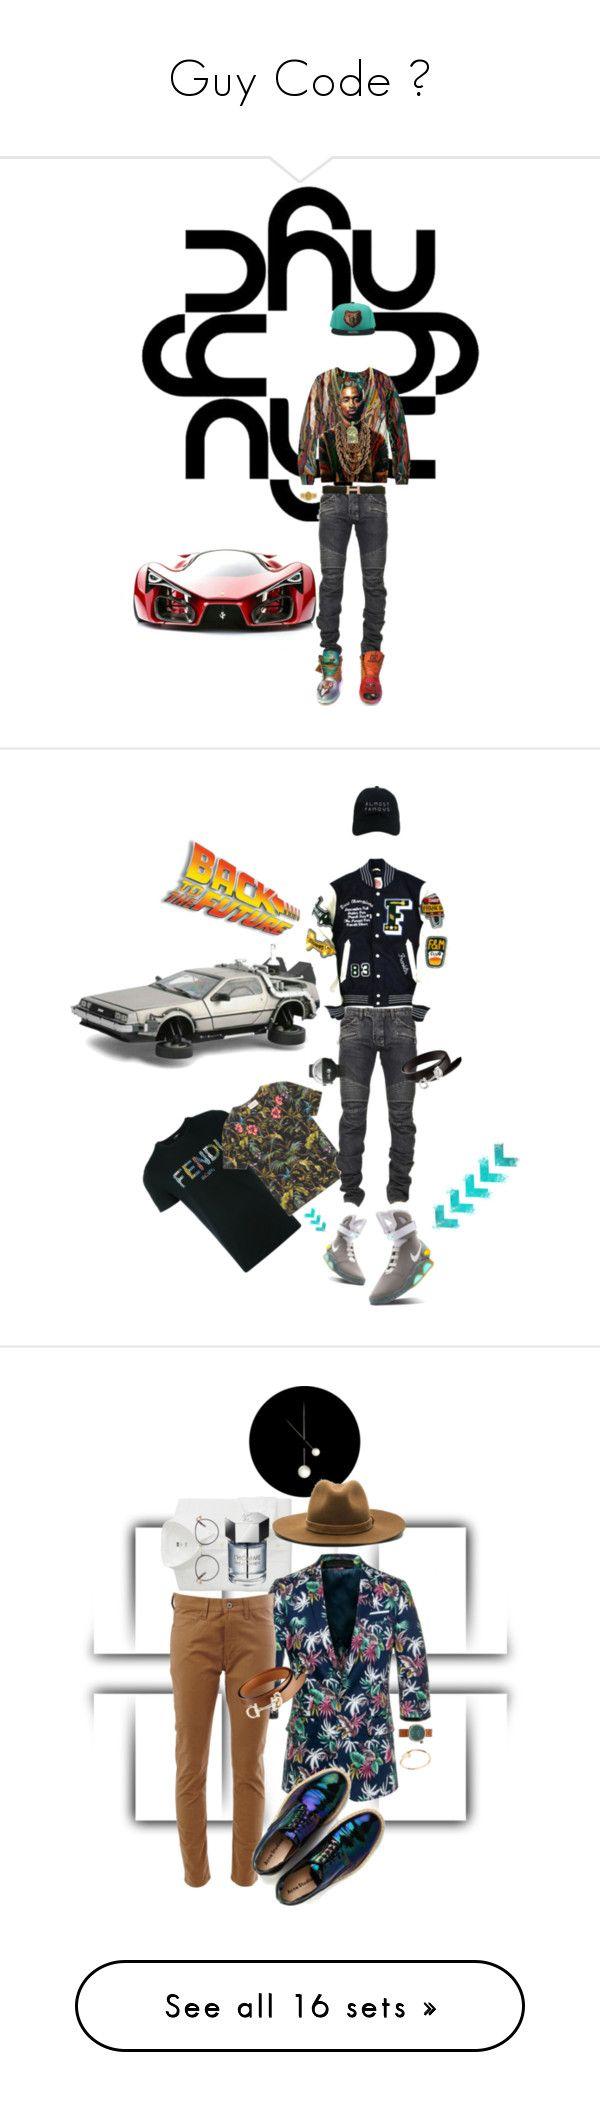 """Guy Code 🔐"" by foreverfreshie ❤ liked on Polyvore featuring Balmain, Hermès, men's fashion, menswear, Fendi, Gucci, Nasaseasons, Klokers, NikeAirMag and Uniqlo"